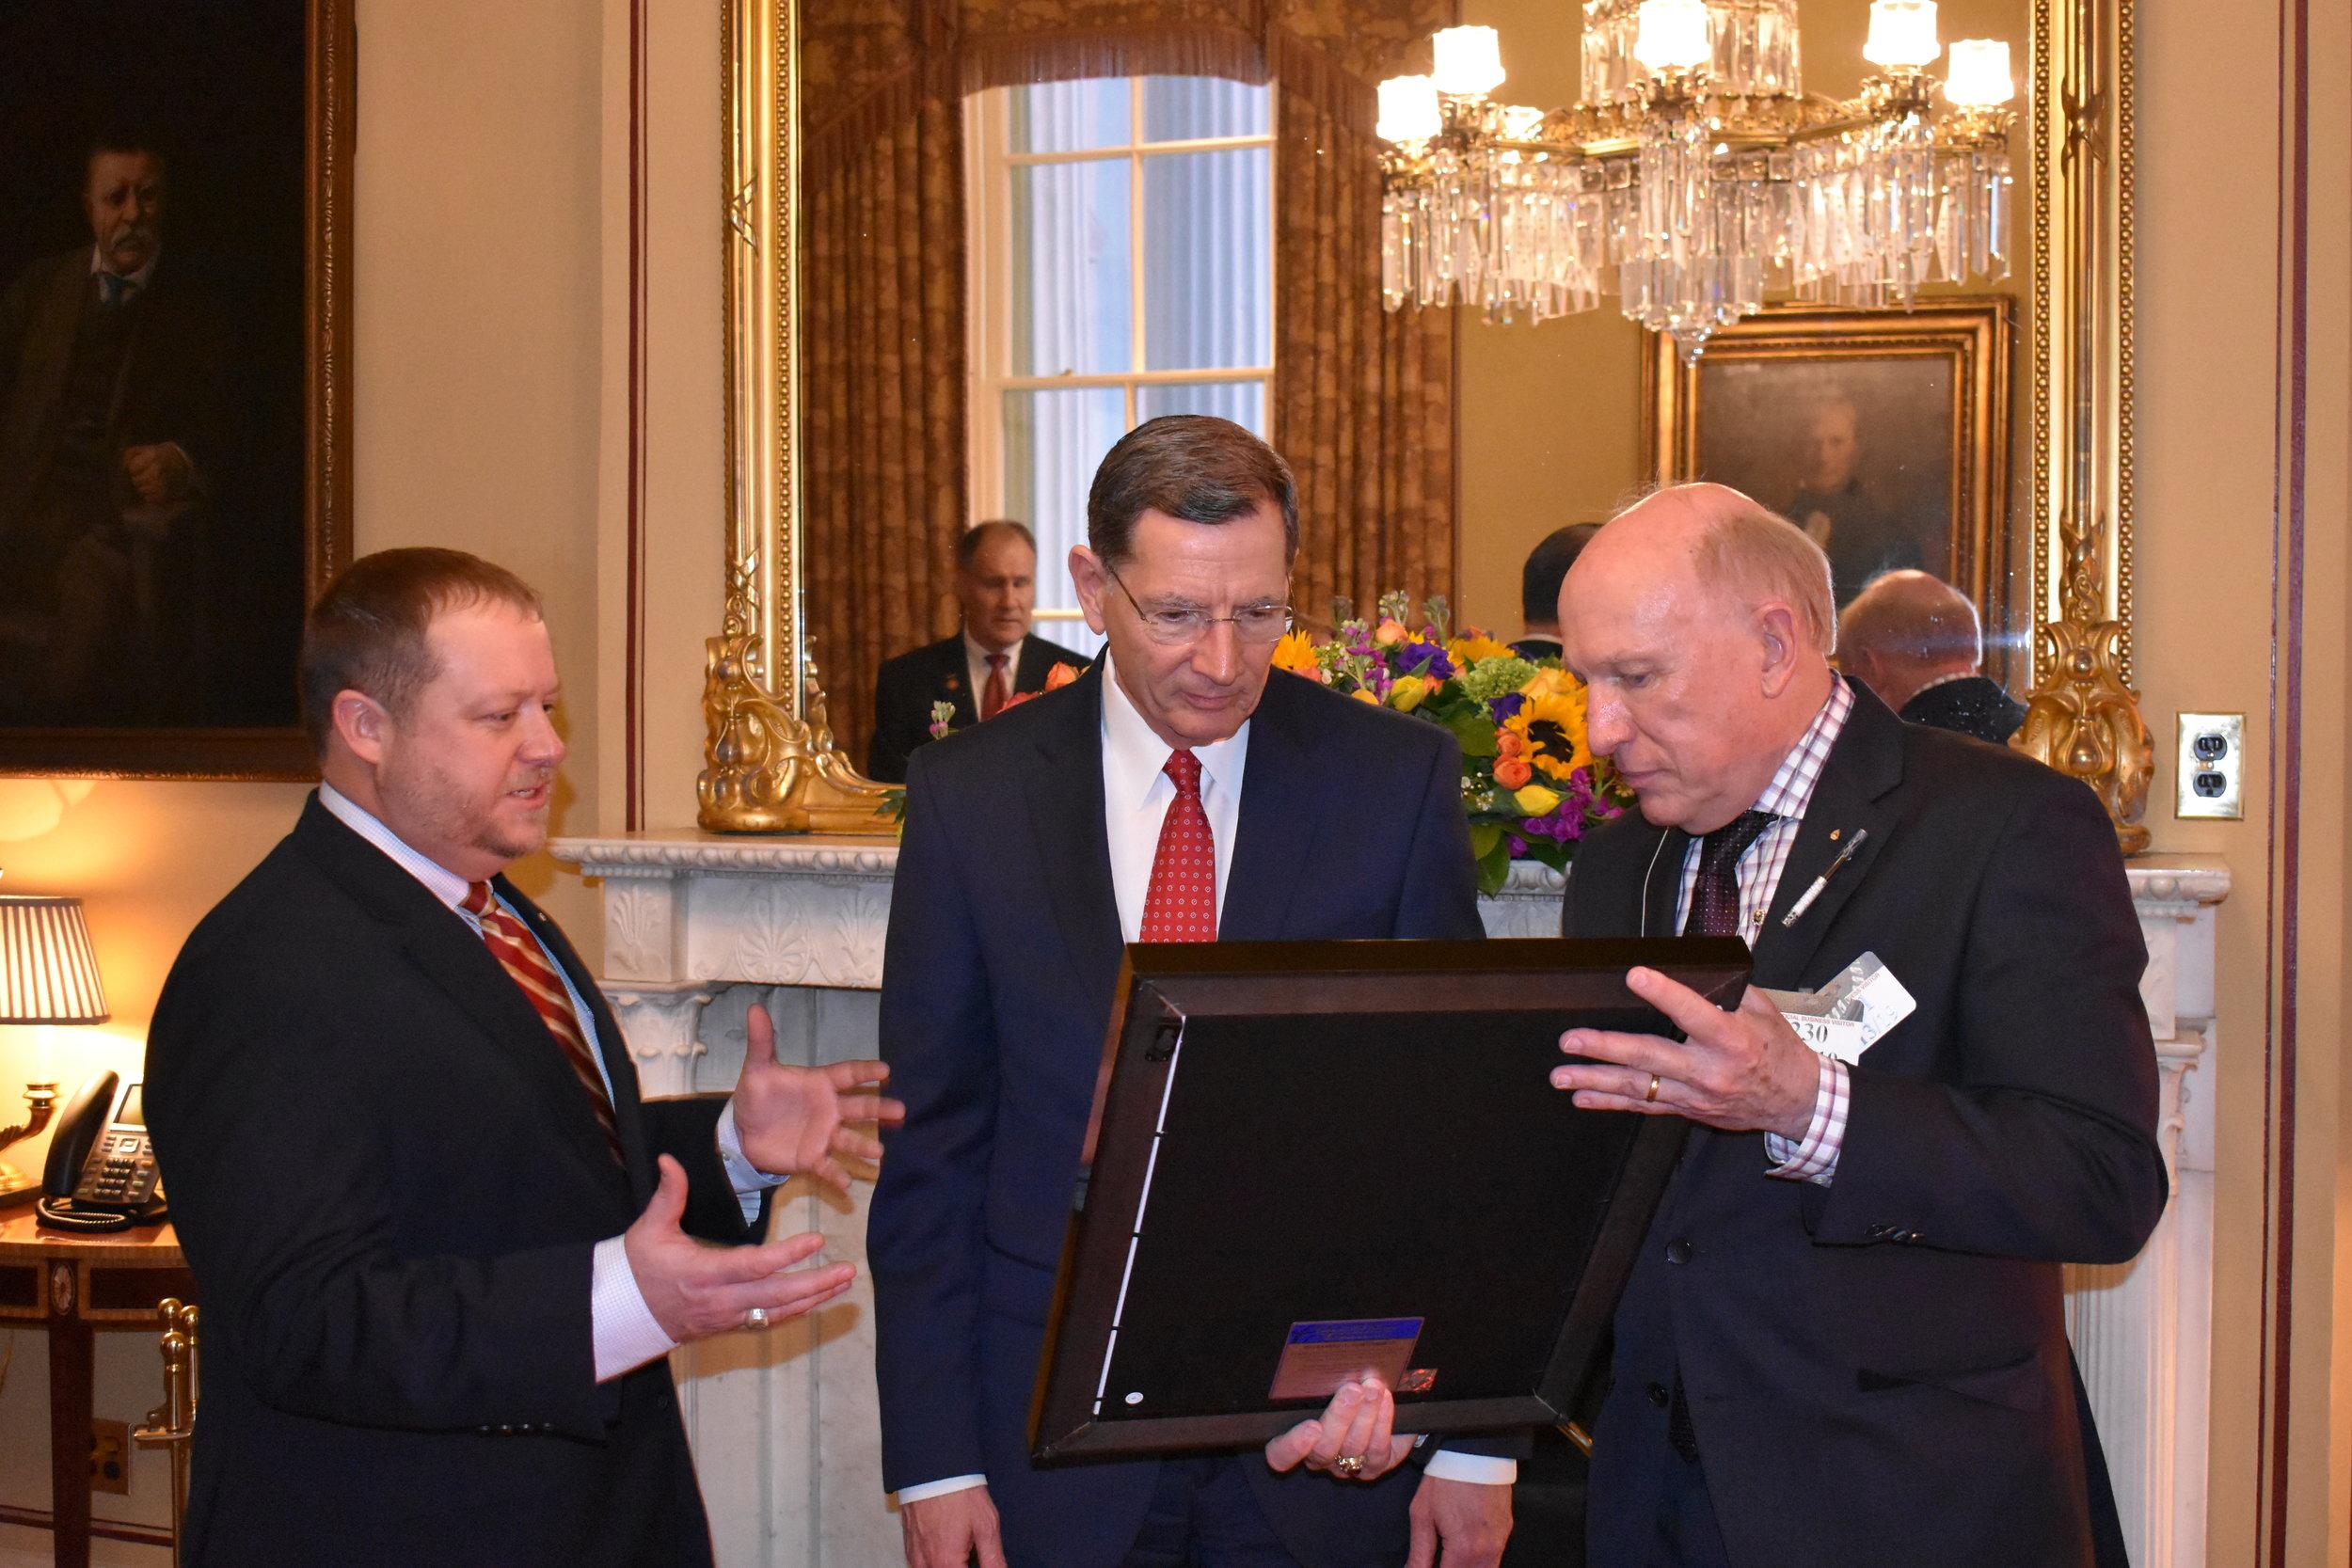 Senator Barrasso being presented the Borradaile Alumnus Award